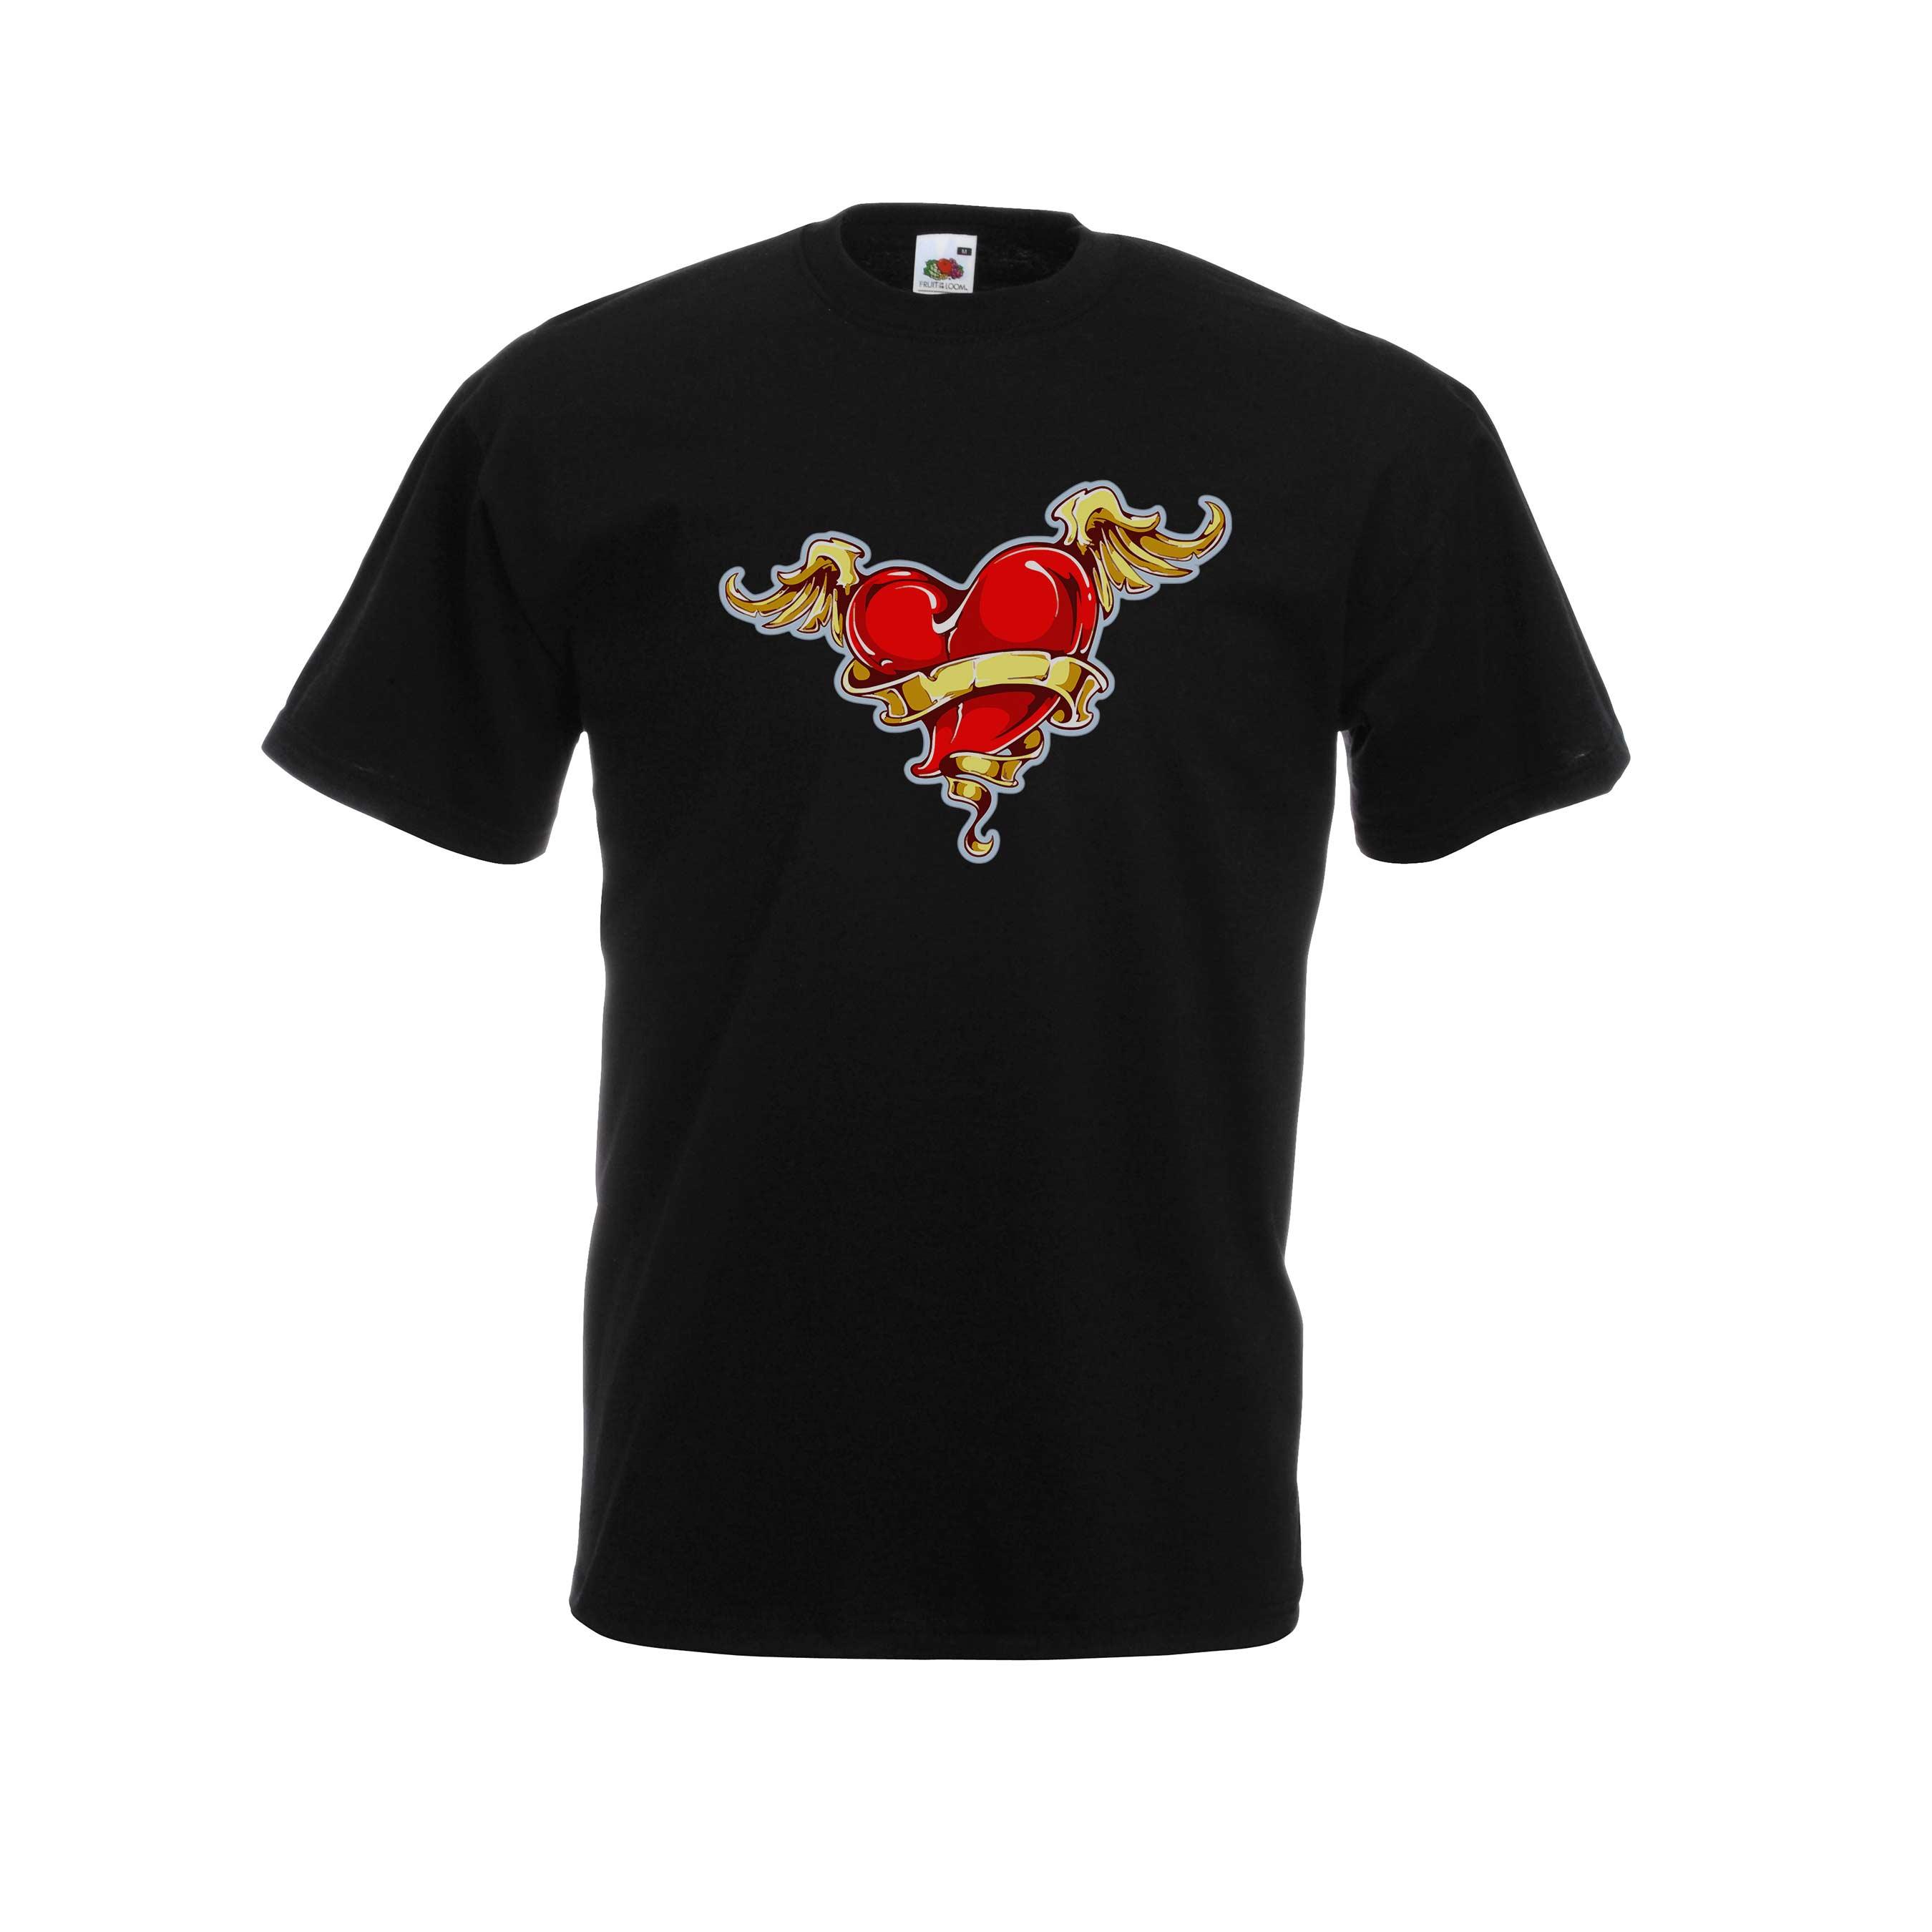 Heart Wings design for t-shirt, hoodie & sweatshirt